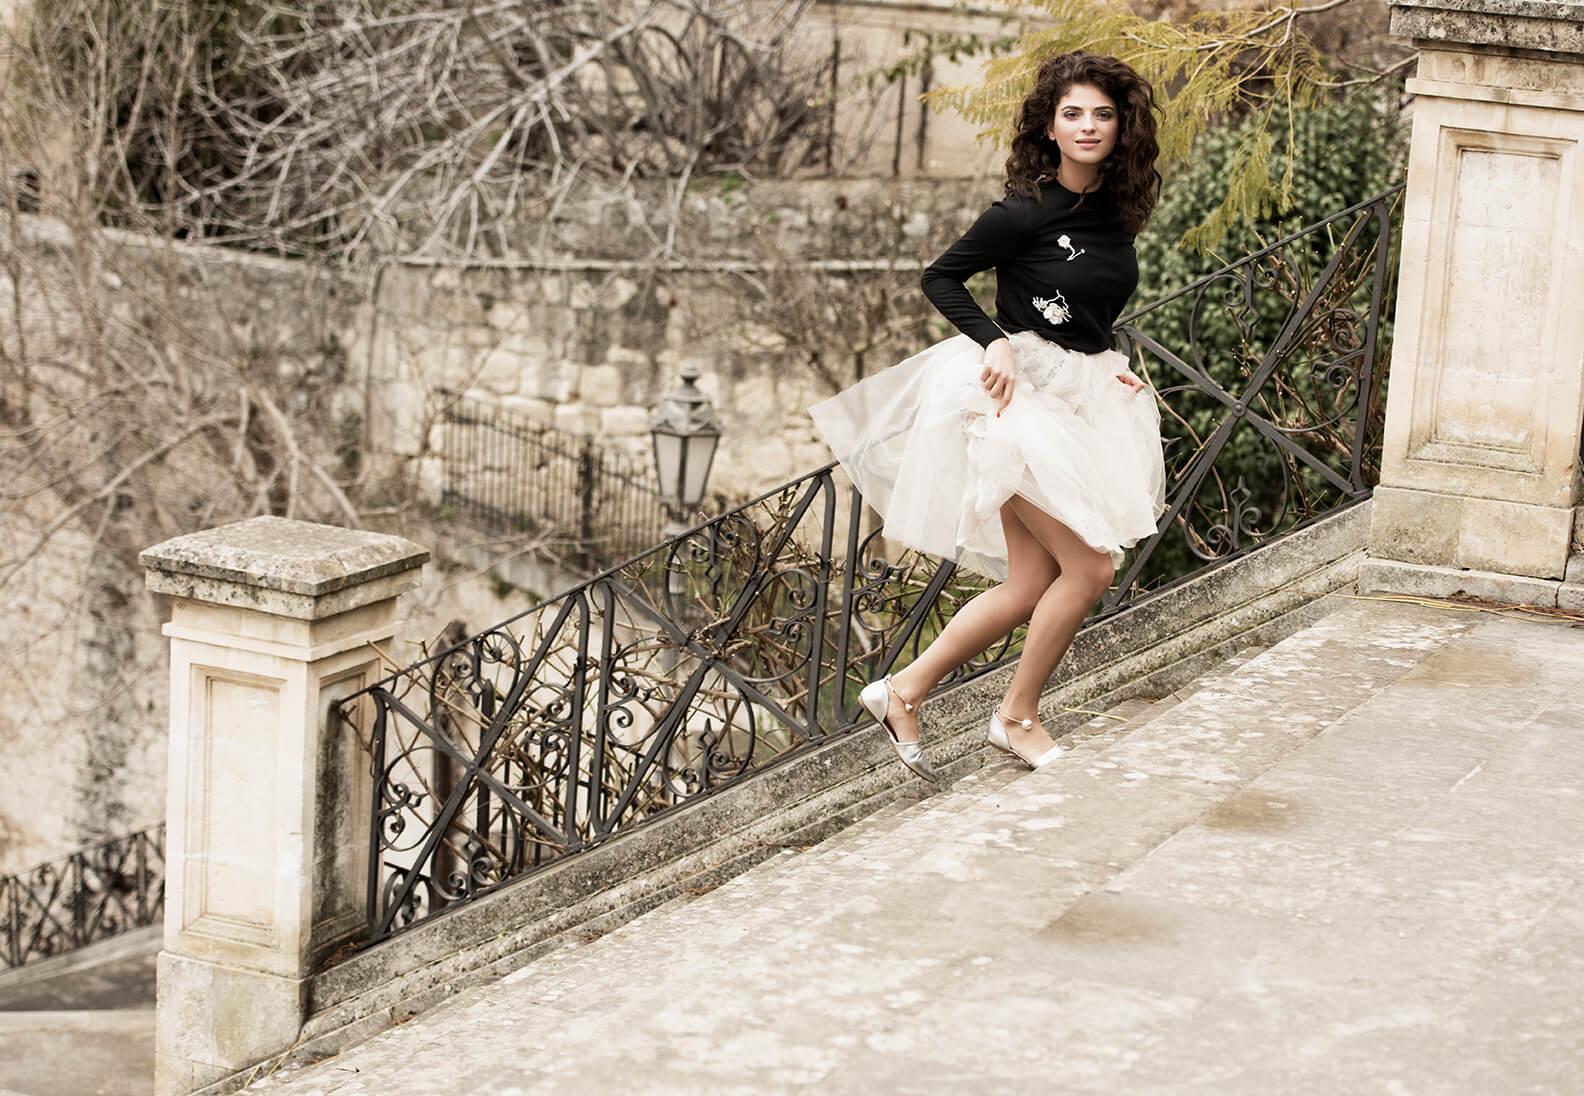 Fashion Shooting mit Spitze in Italien